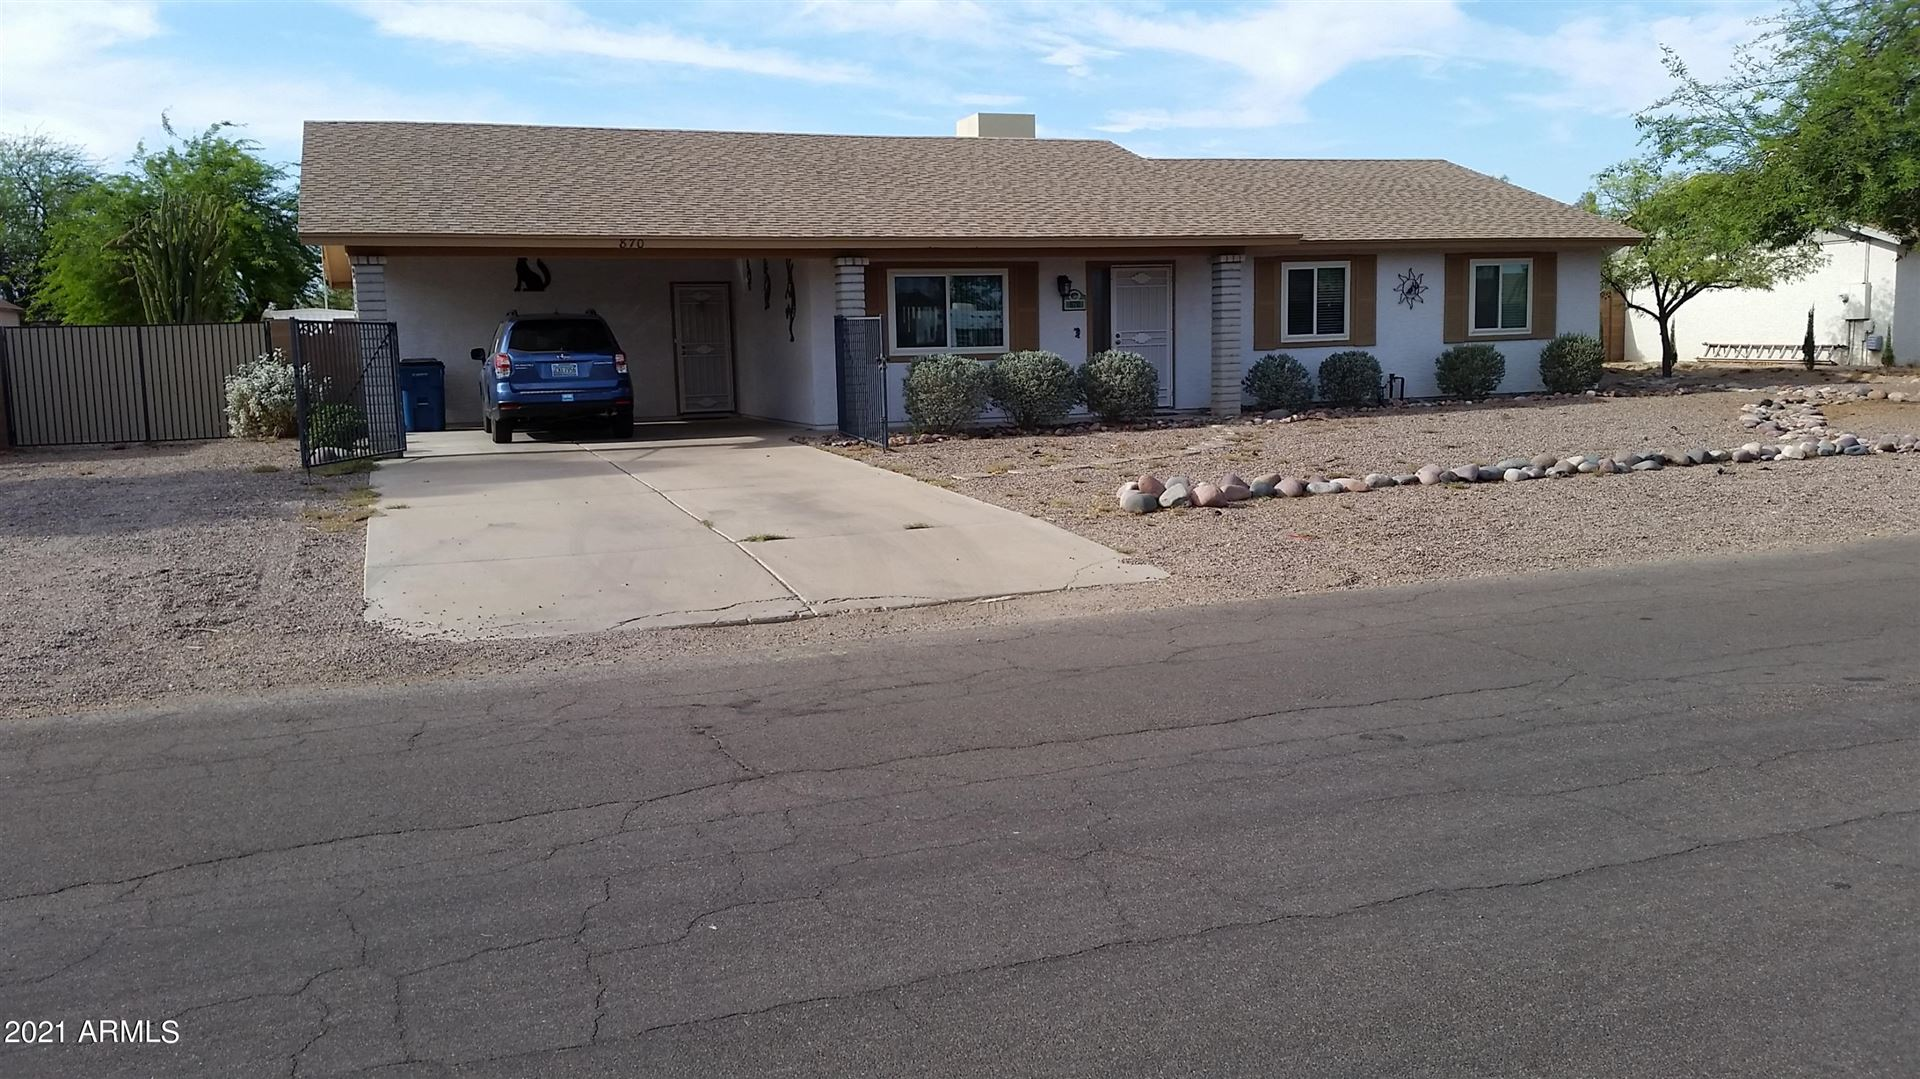 Photo of 870 E NAVAJO Avenue, Apache Junction, AZ 85119 (MLS # 6245442)